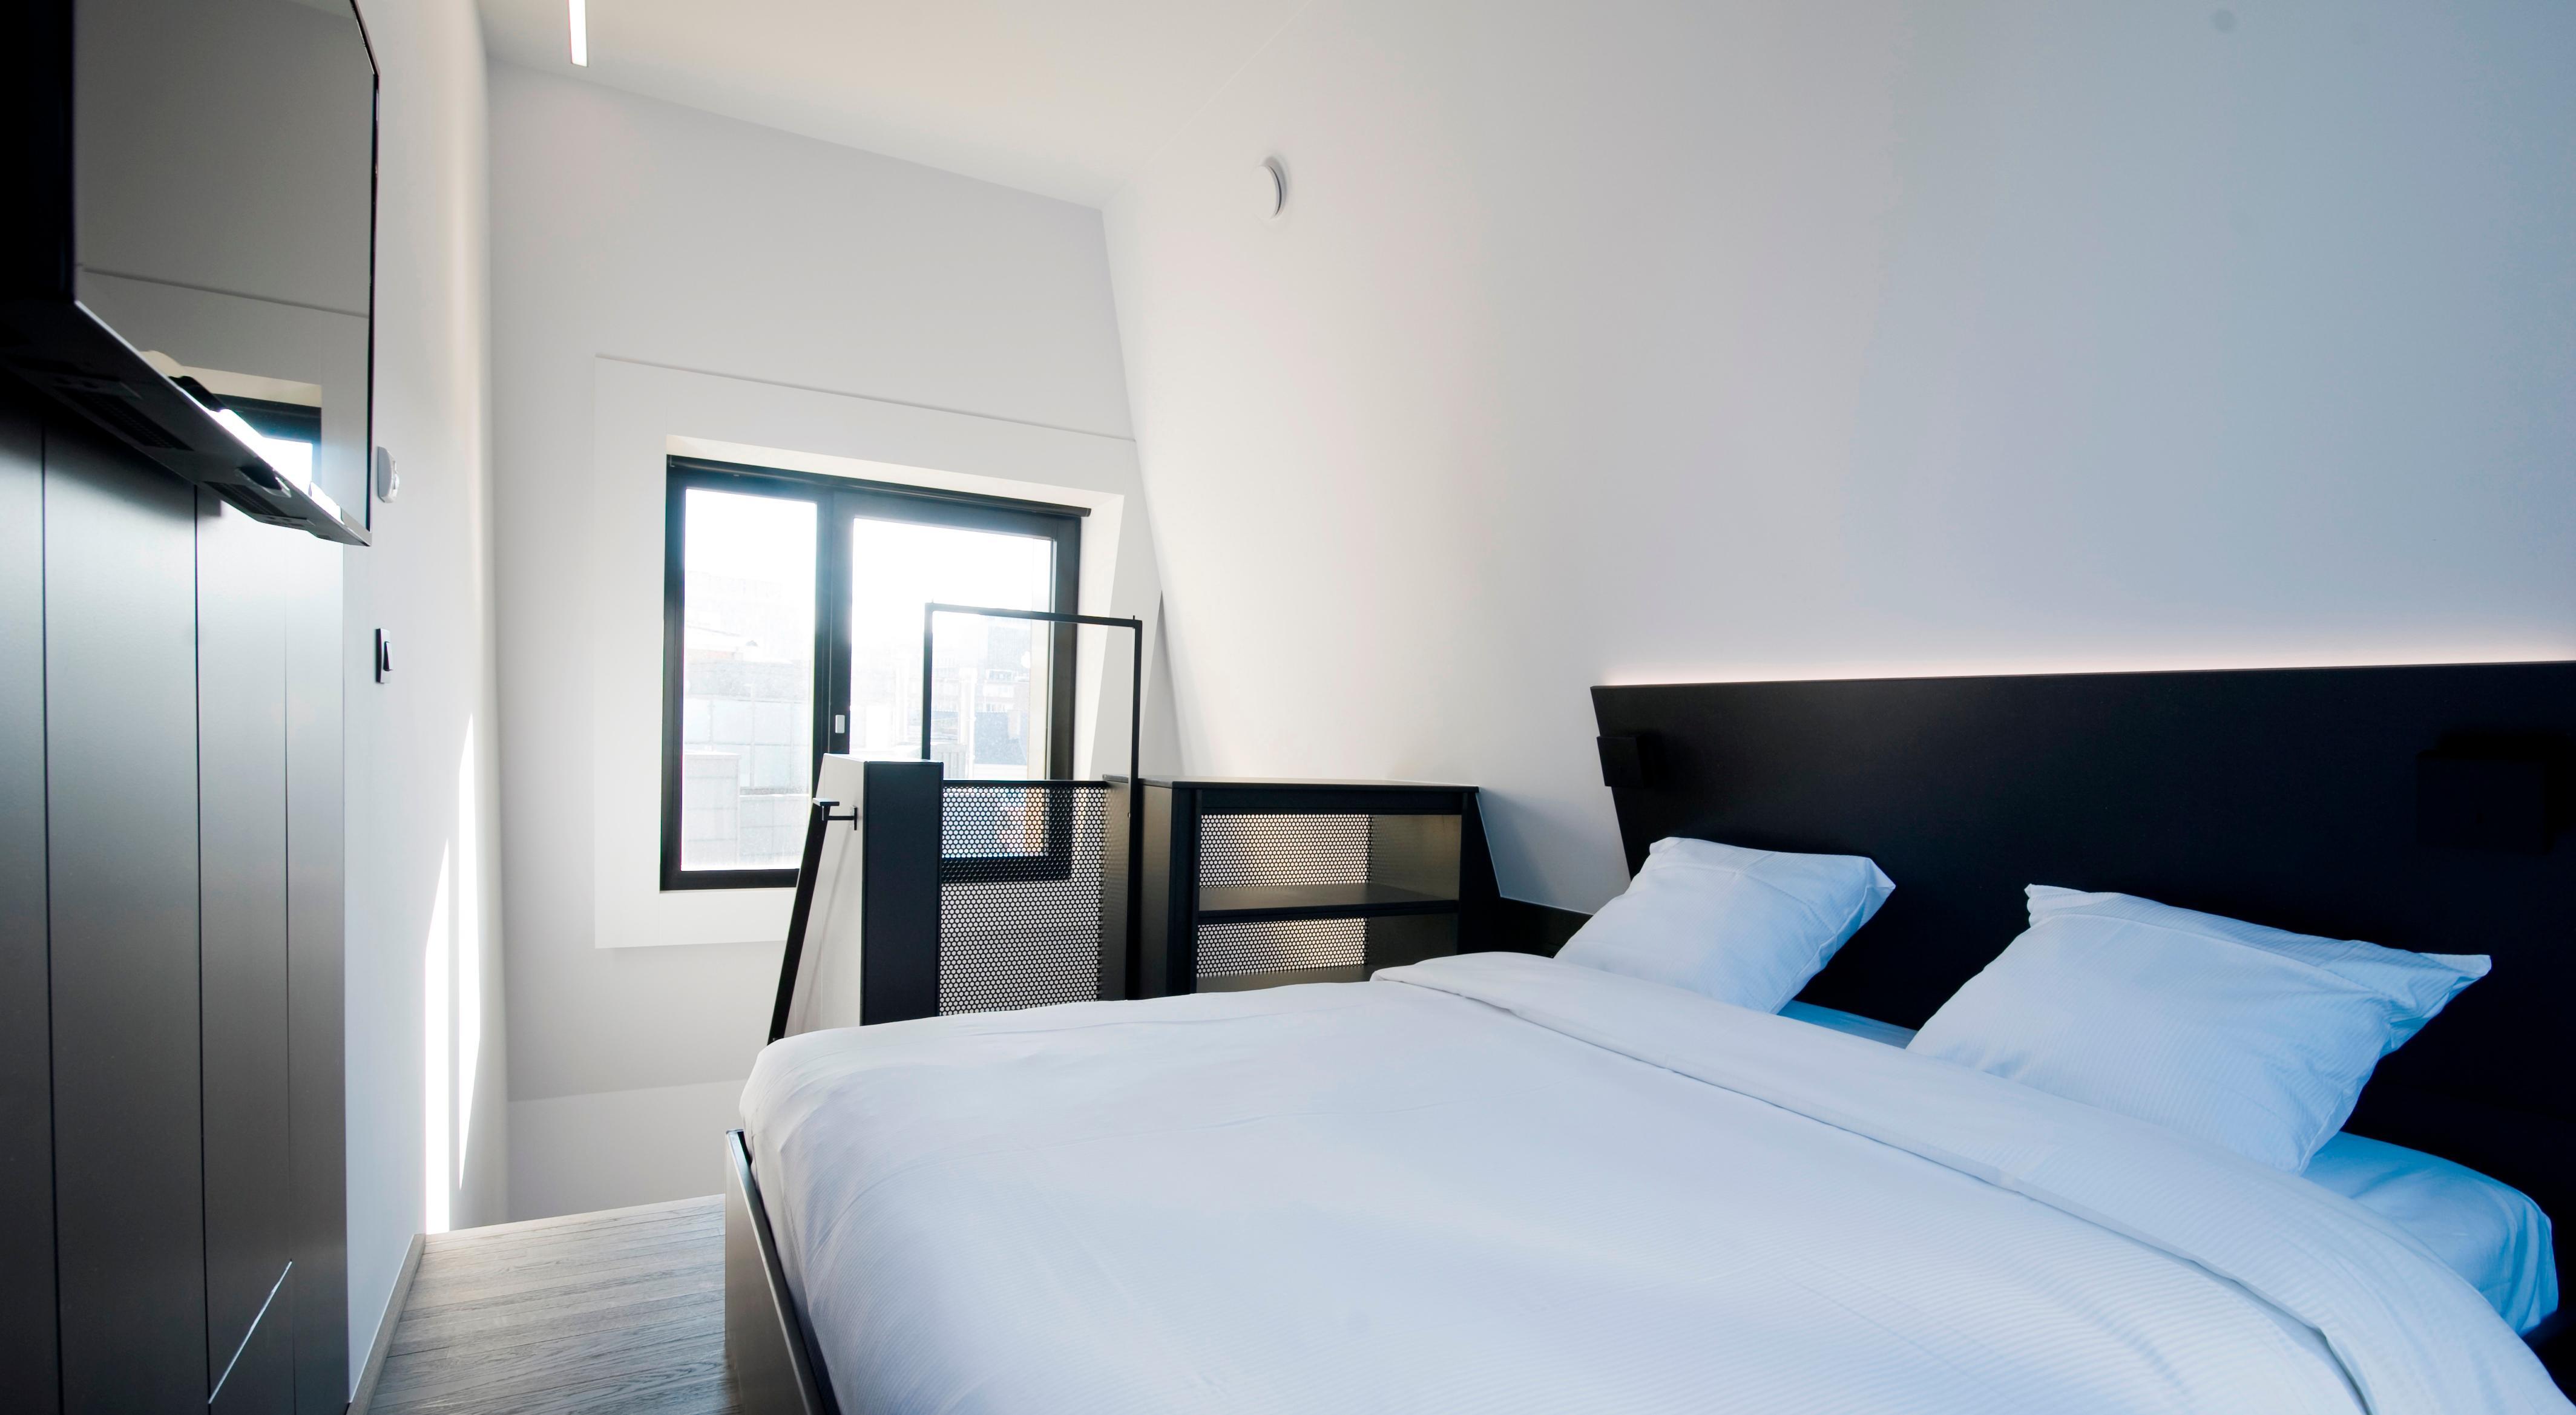 Ticket + Sleep Well Hostel